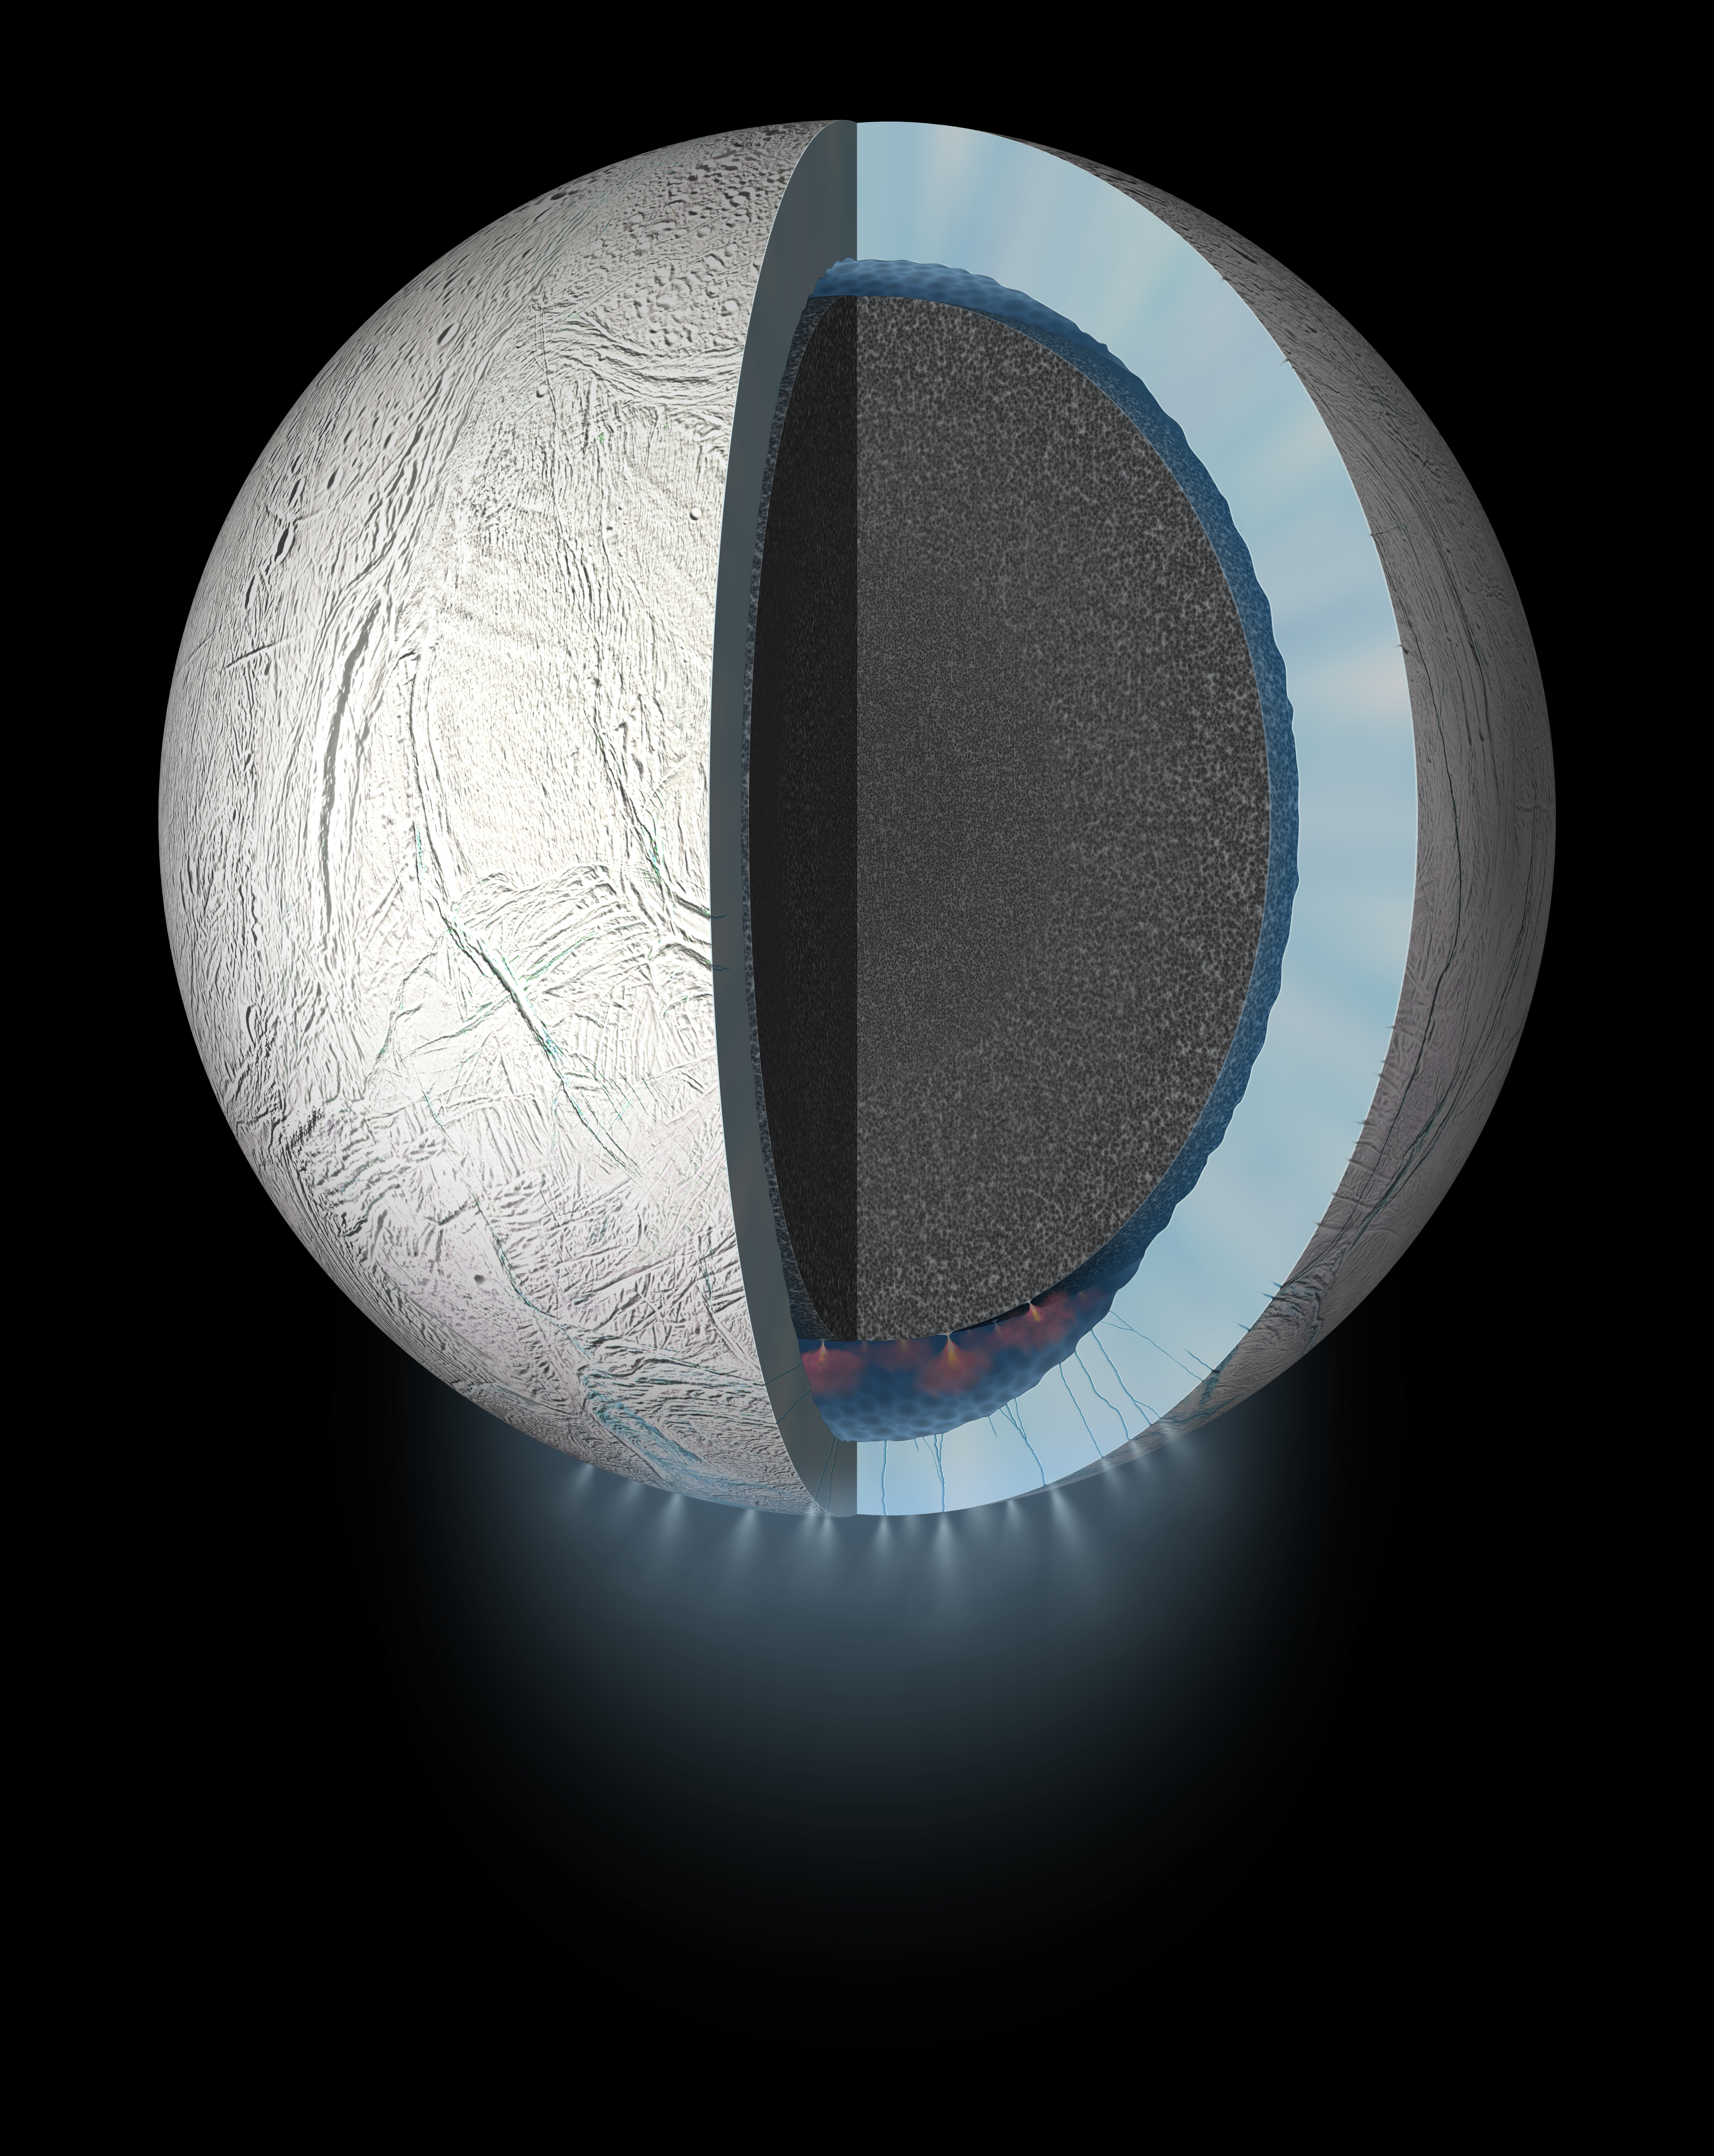 Rendering artistico di Encelado con focus sulla struttura interna. Credits: NASA